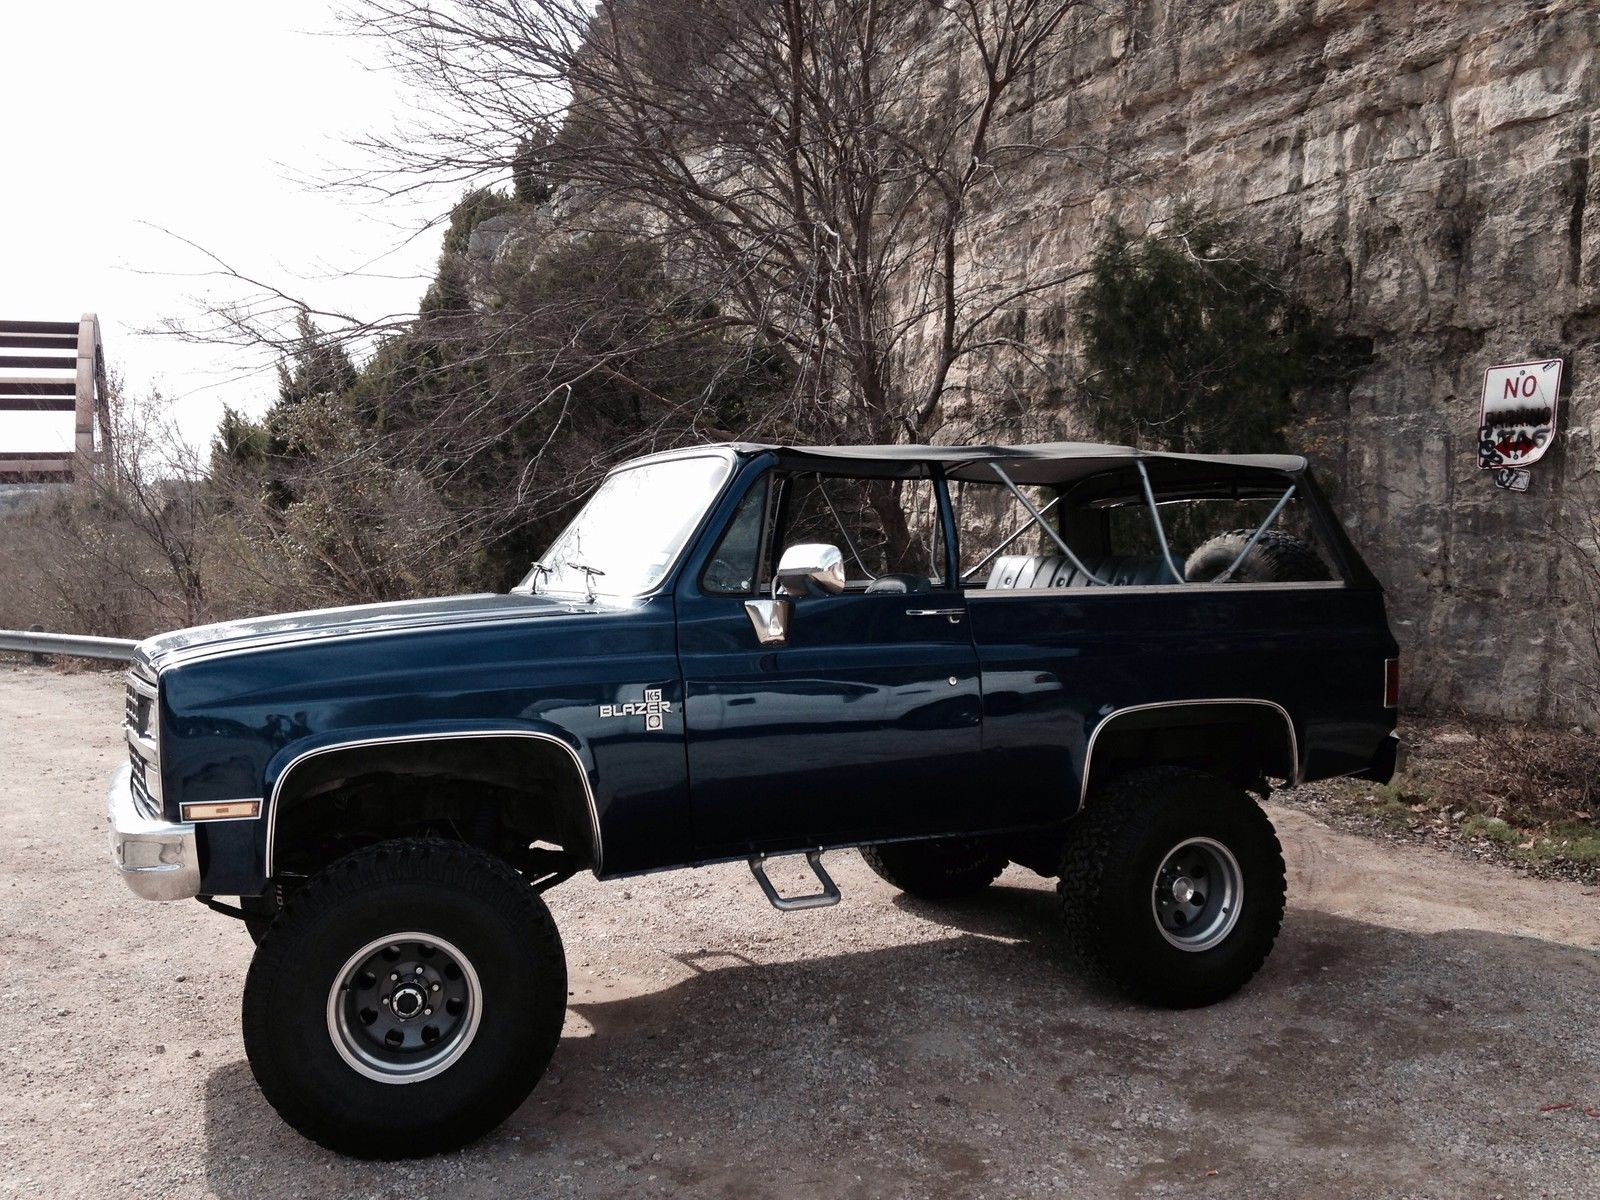 1974 Chevrolet K5 Blazer gmc jimmy lifted 383 stroker ...